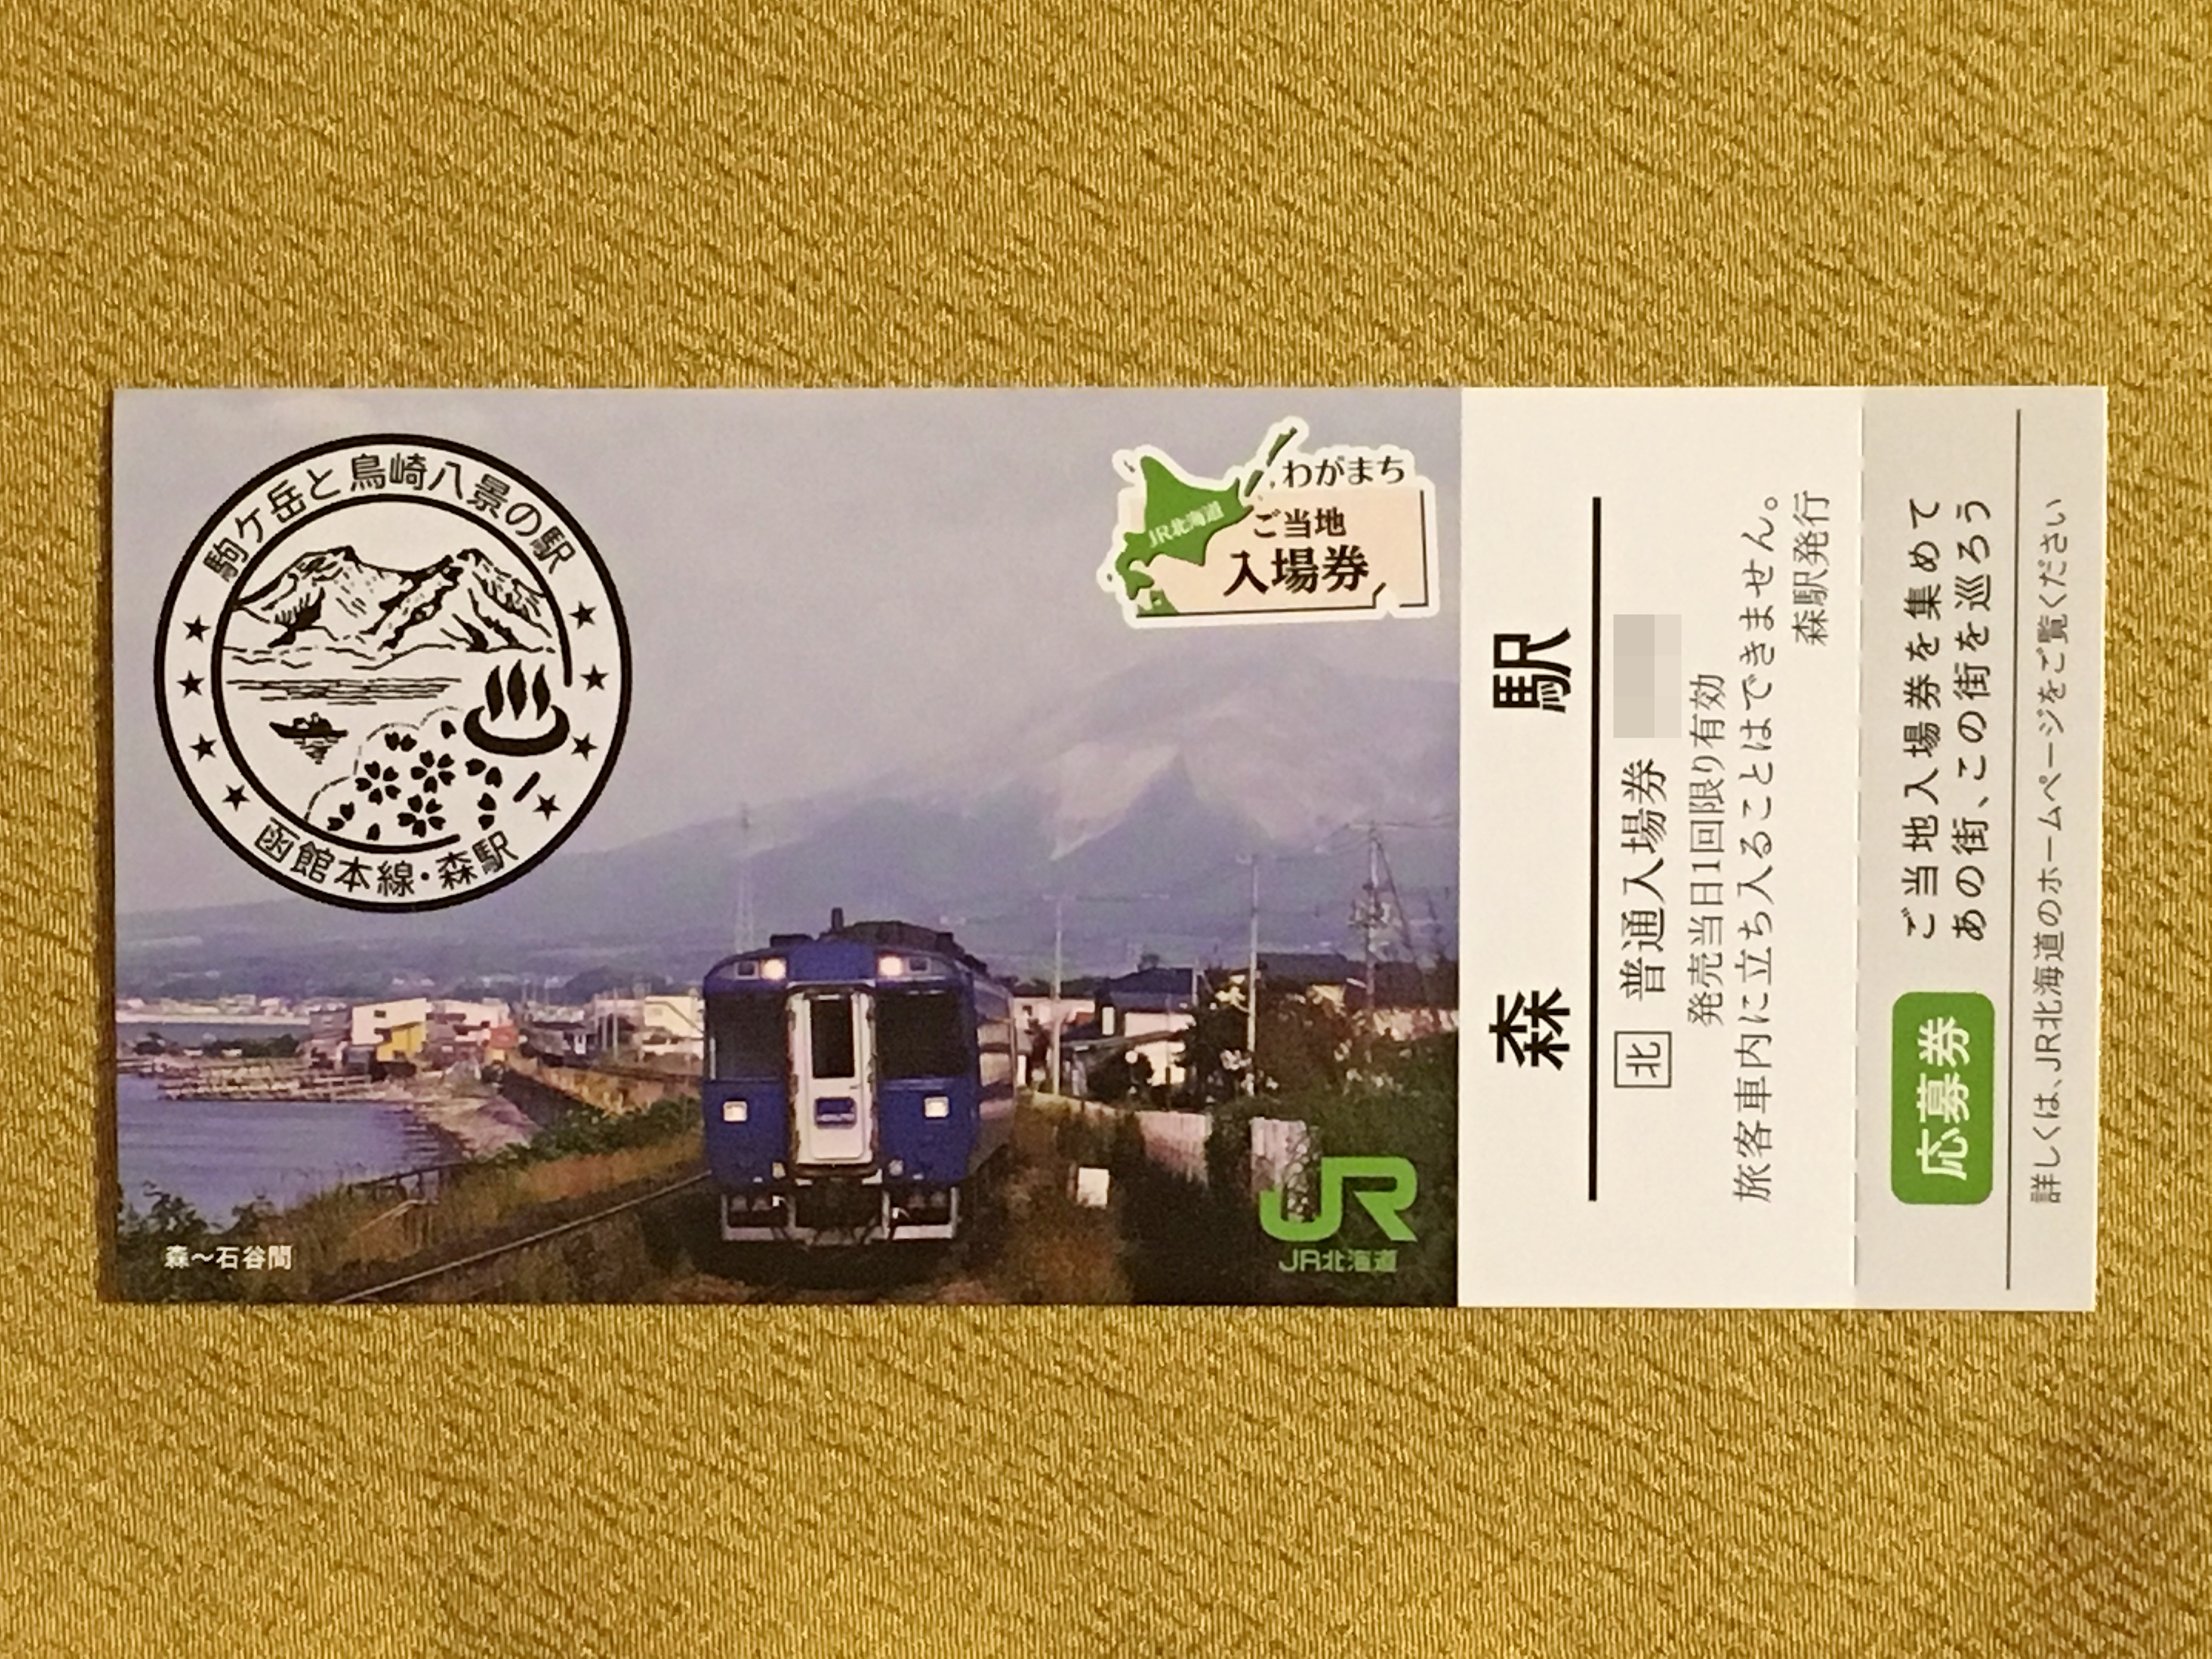 JR北海道ご当地入場券 森駅表.JPG